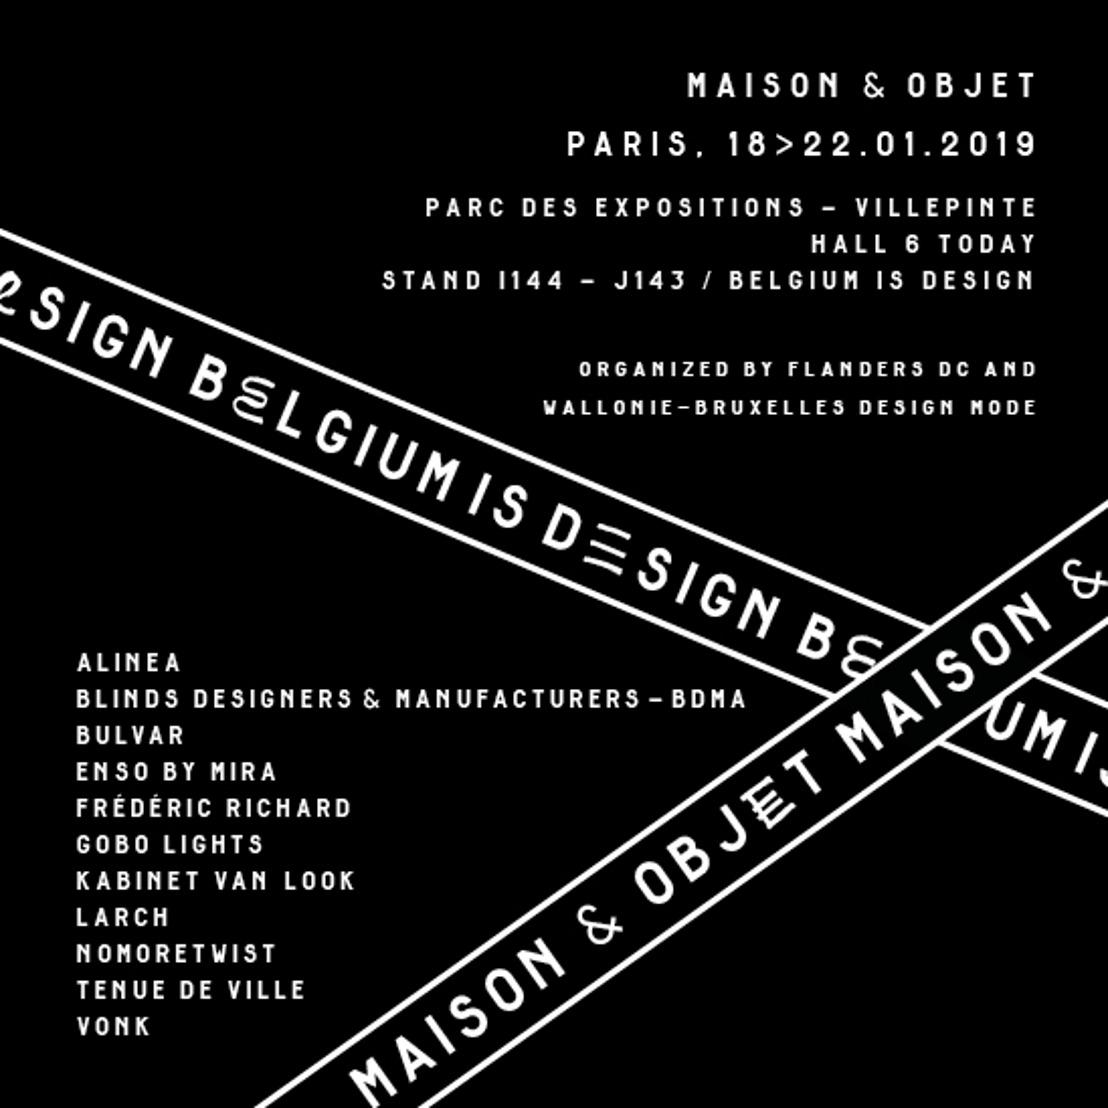 Belgium is Design // Maison&Objet (Parijs, 18 - 22/01/2019)